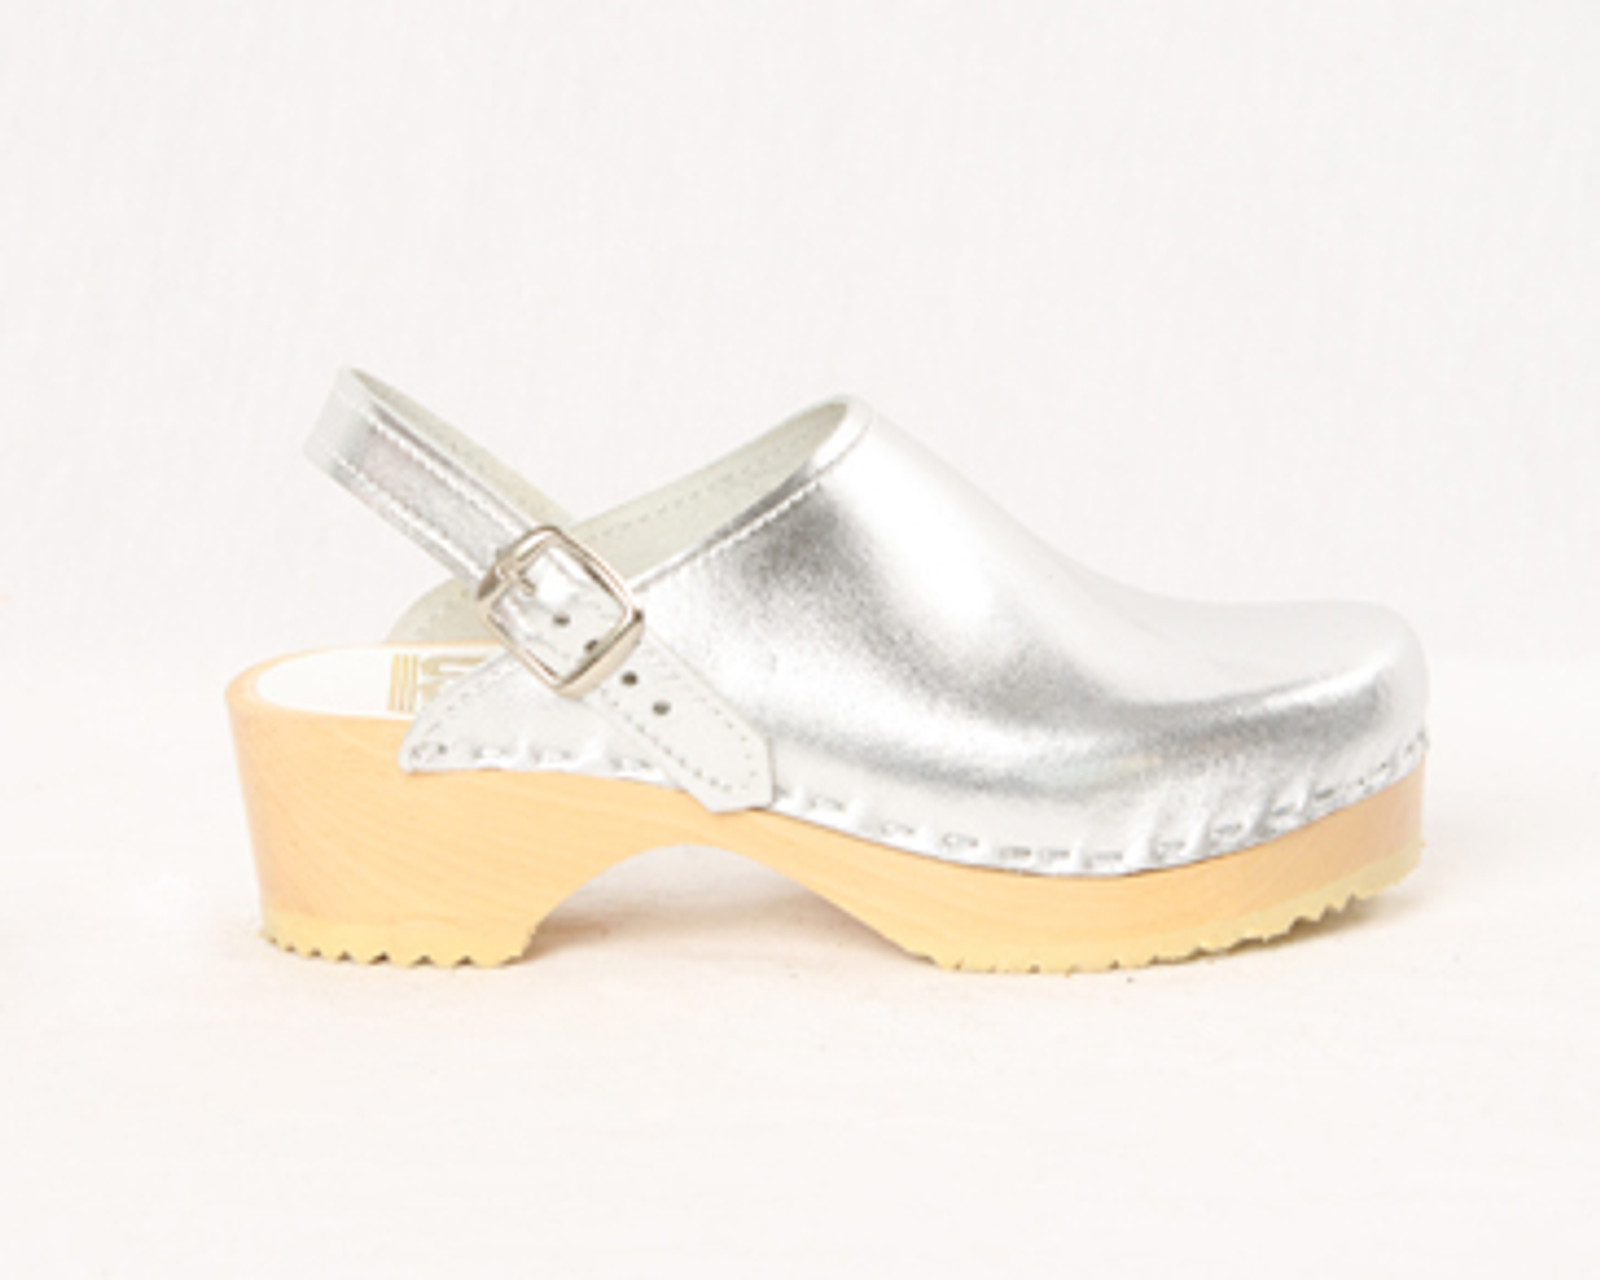 Sling Strap Clogs - Swedish - Low Heel